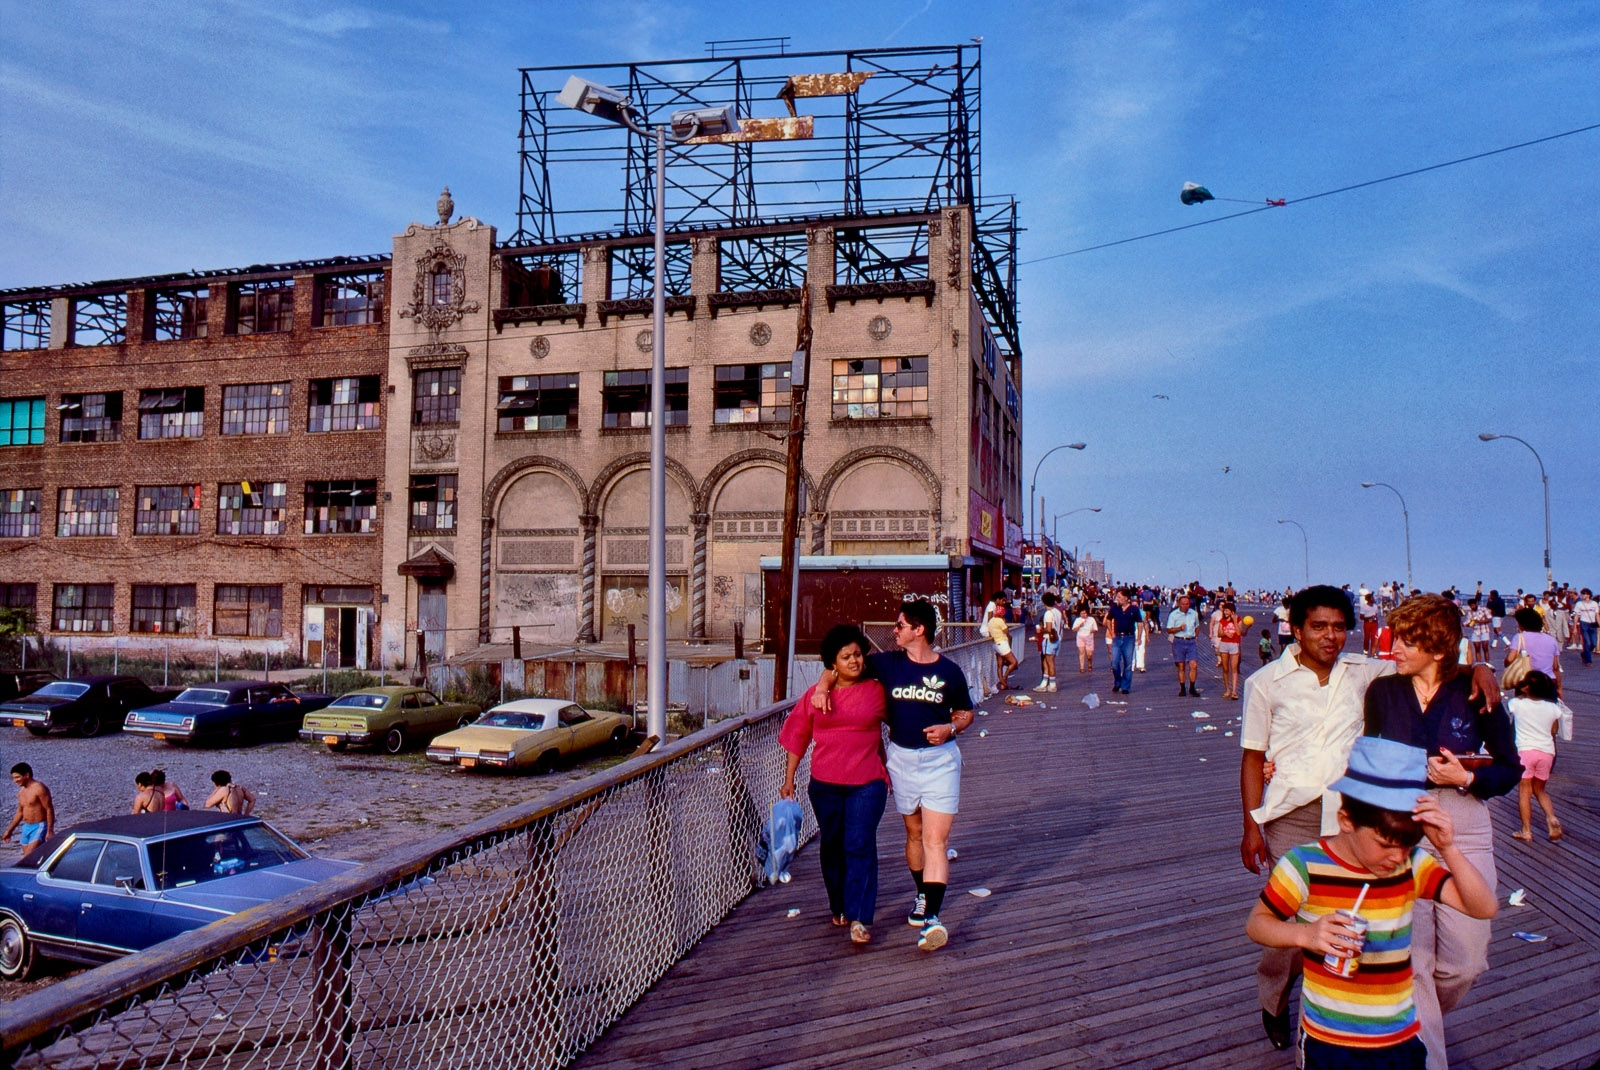 Coney Island boardwalk in summer